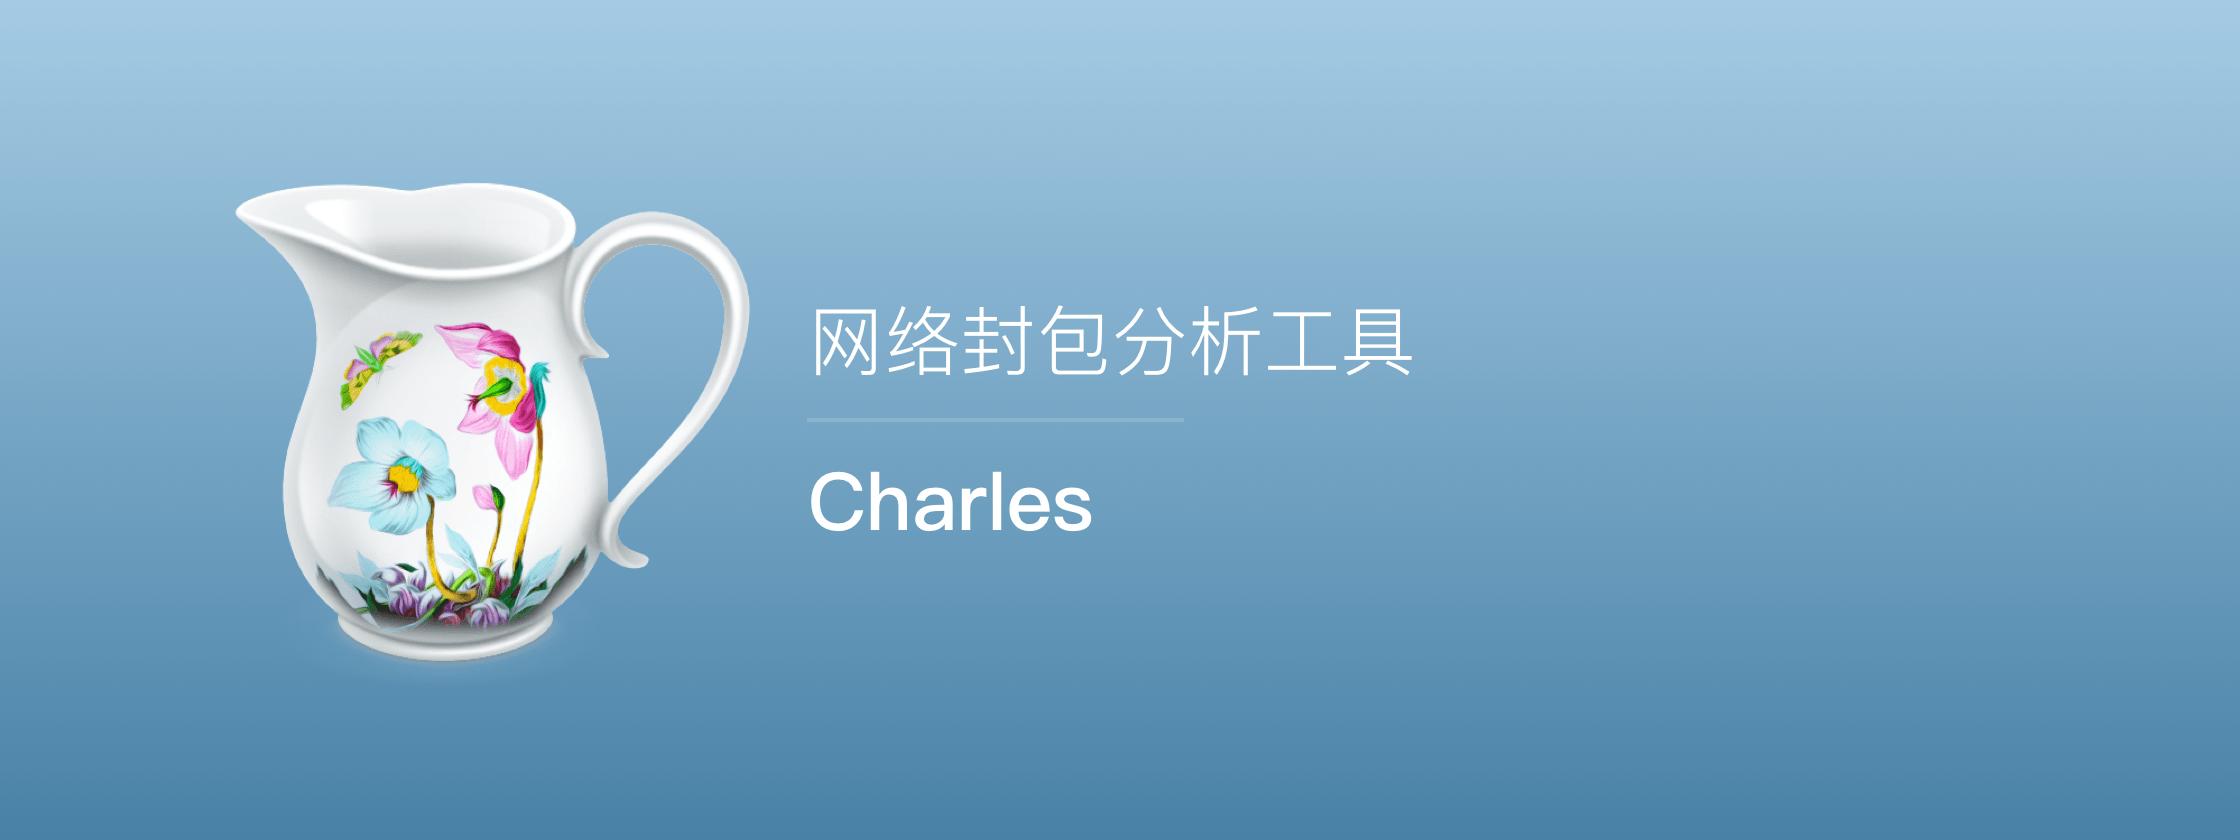 Charles – 网络封包分析工具